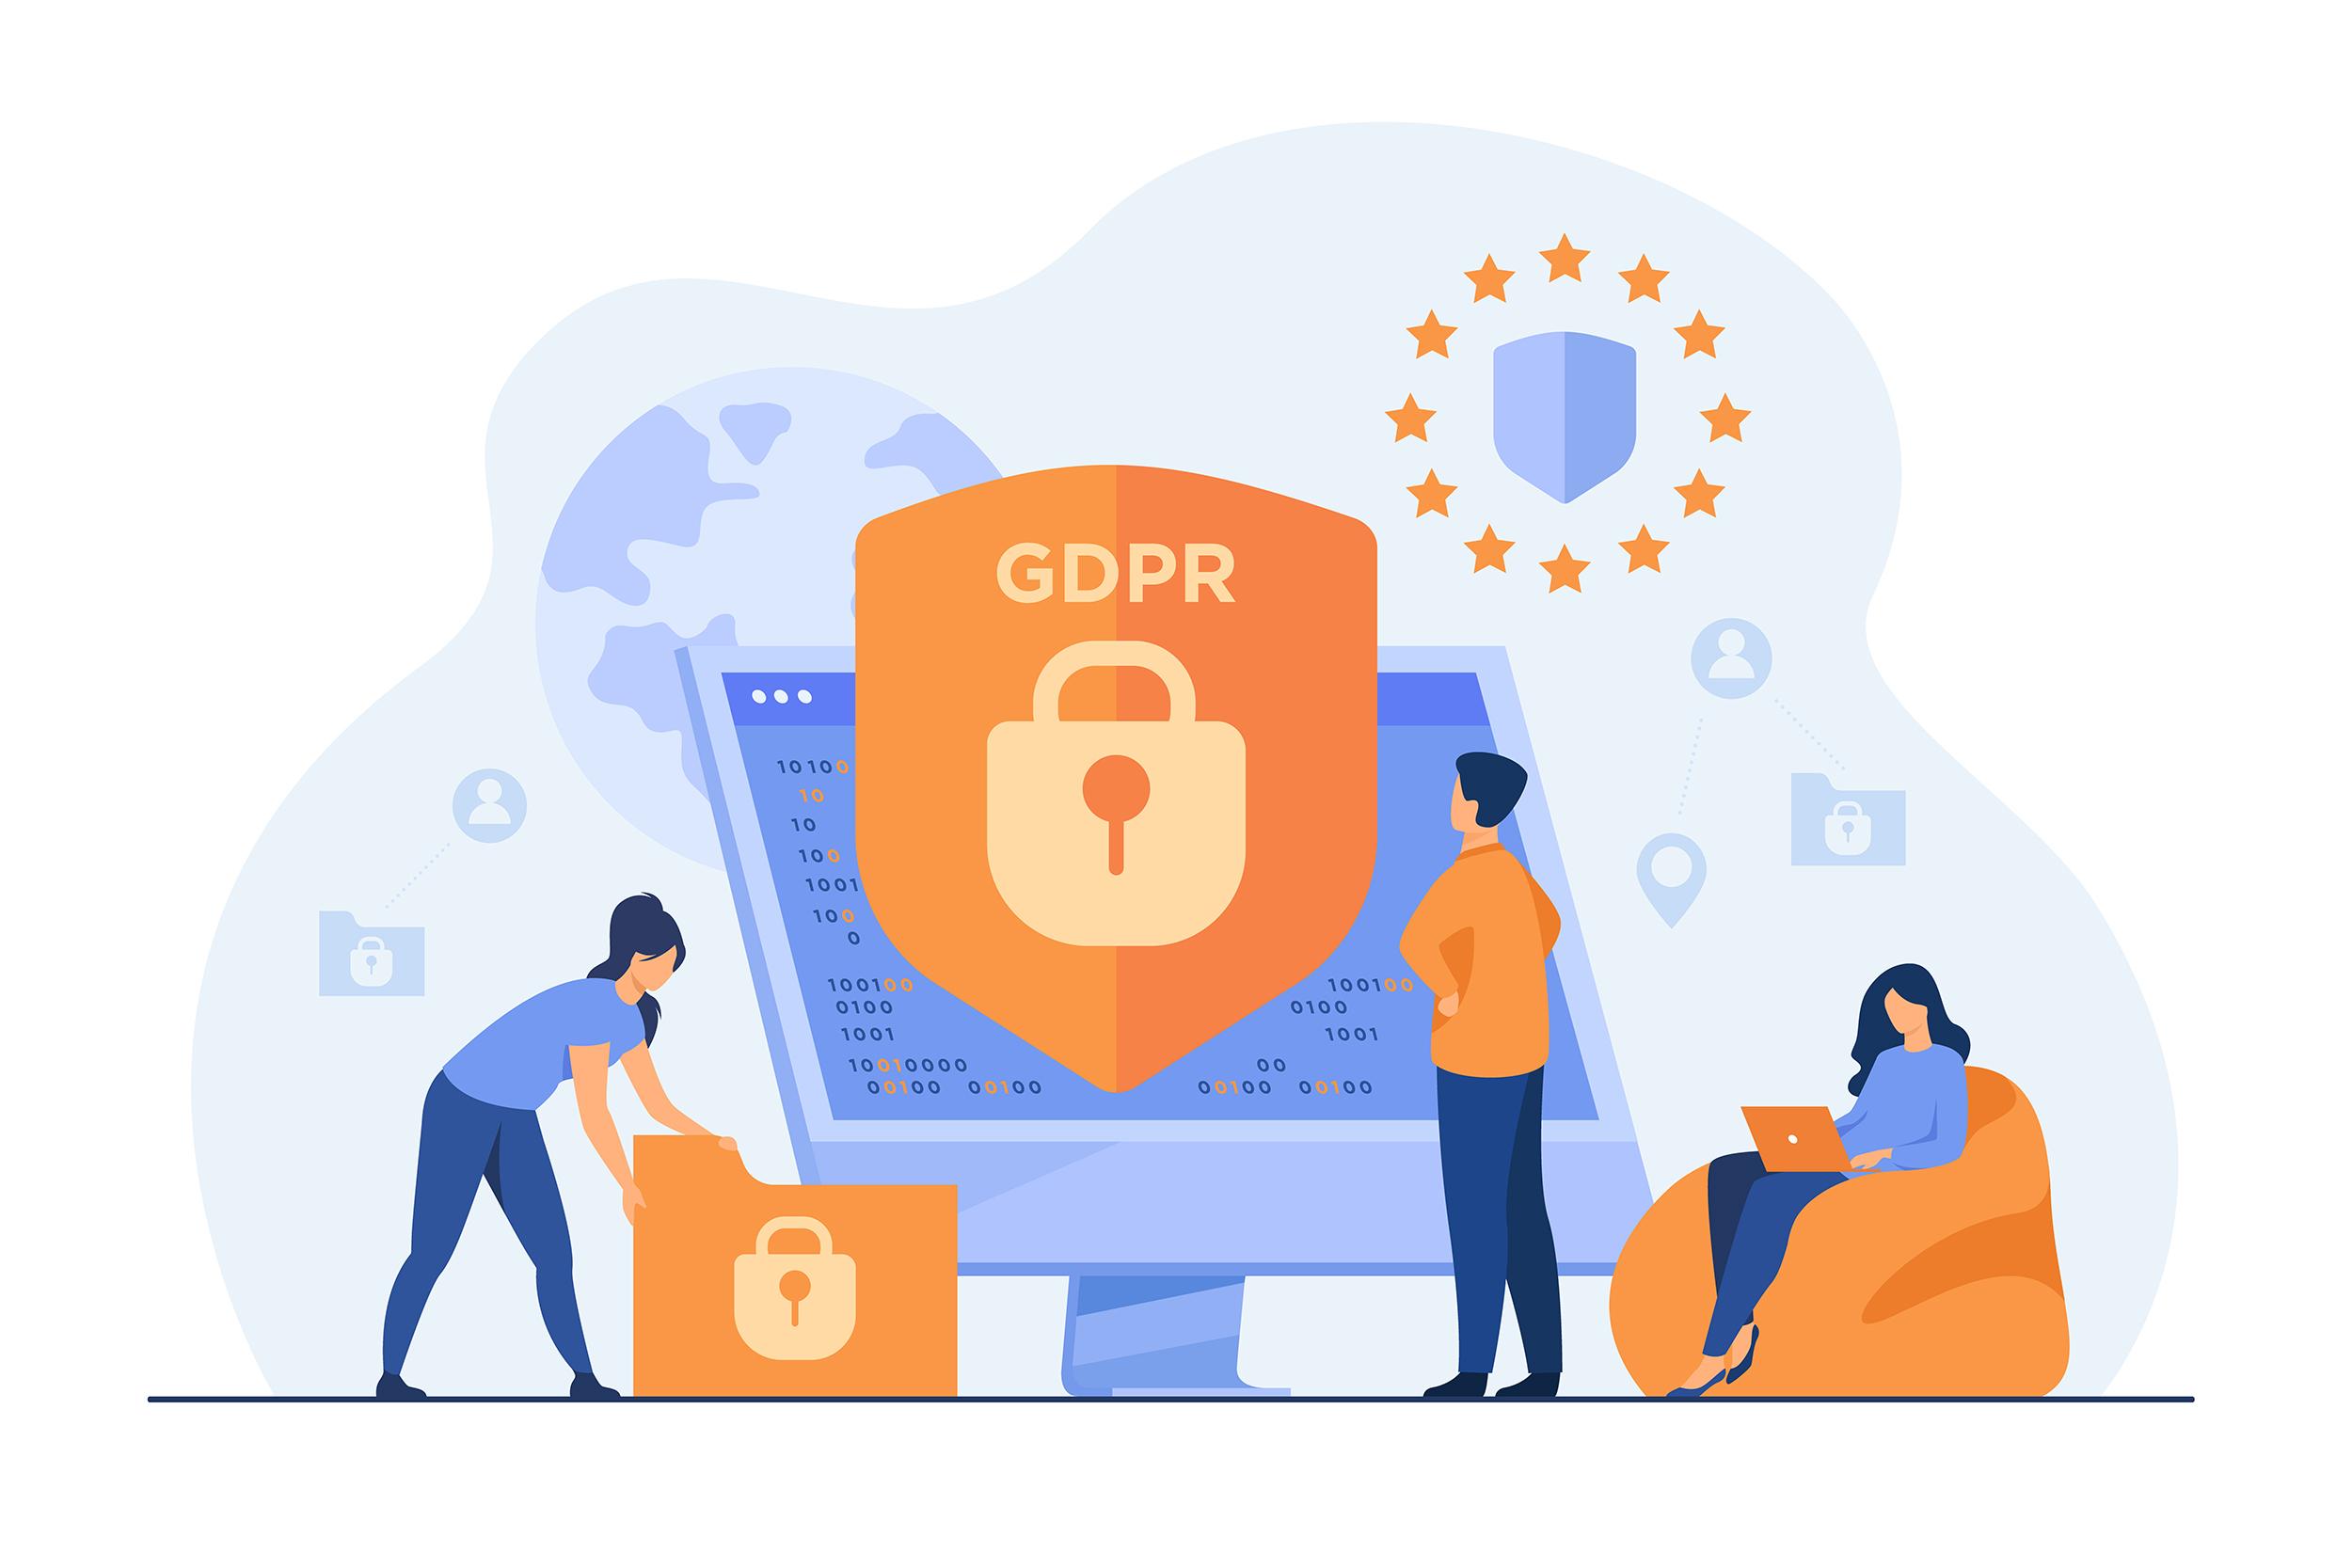 GDPR for online platfroms